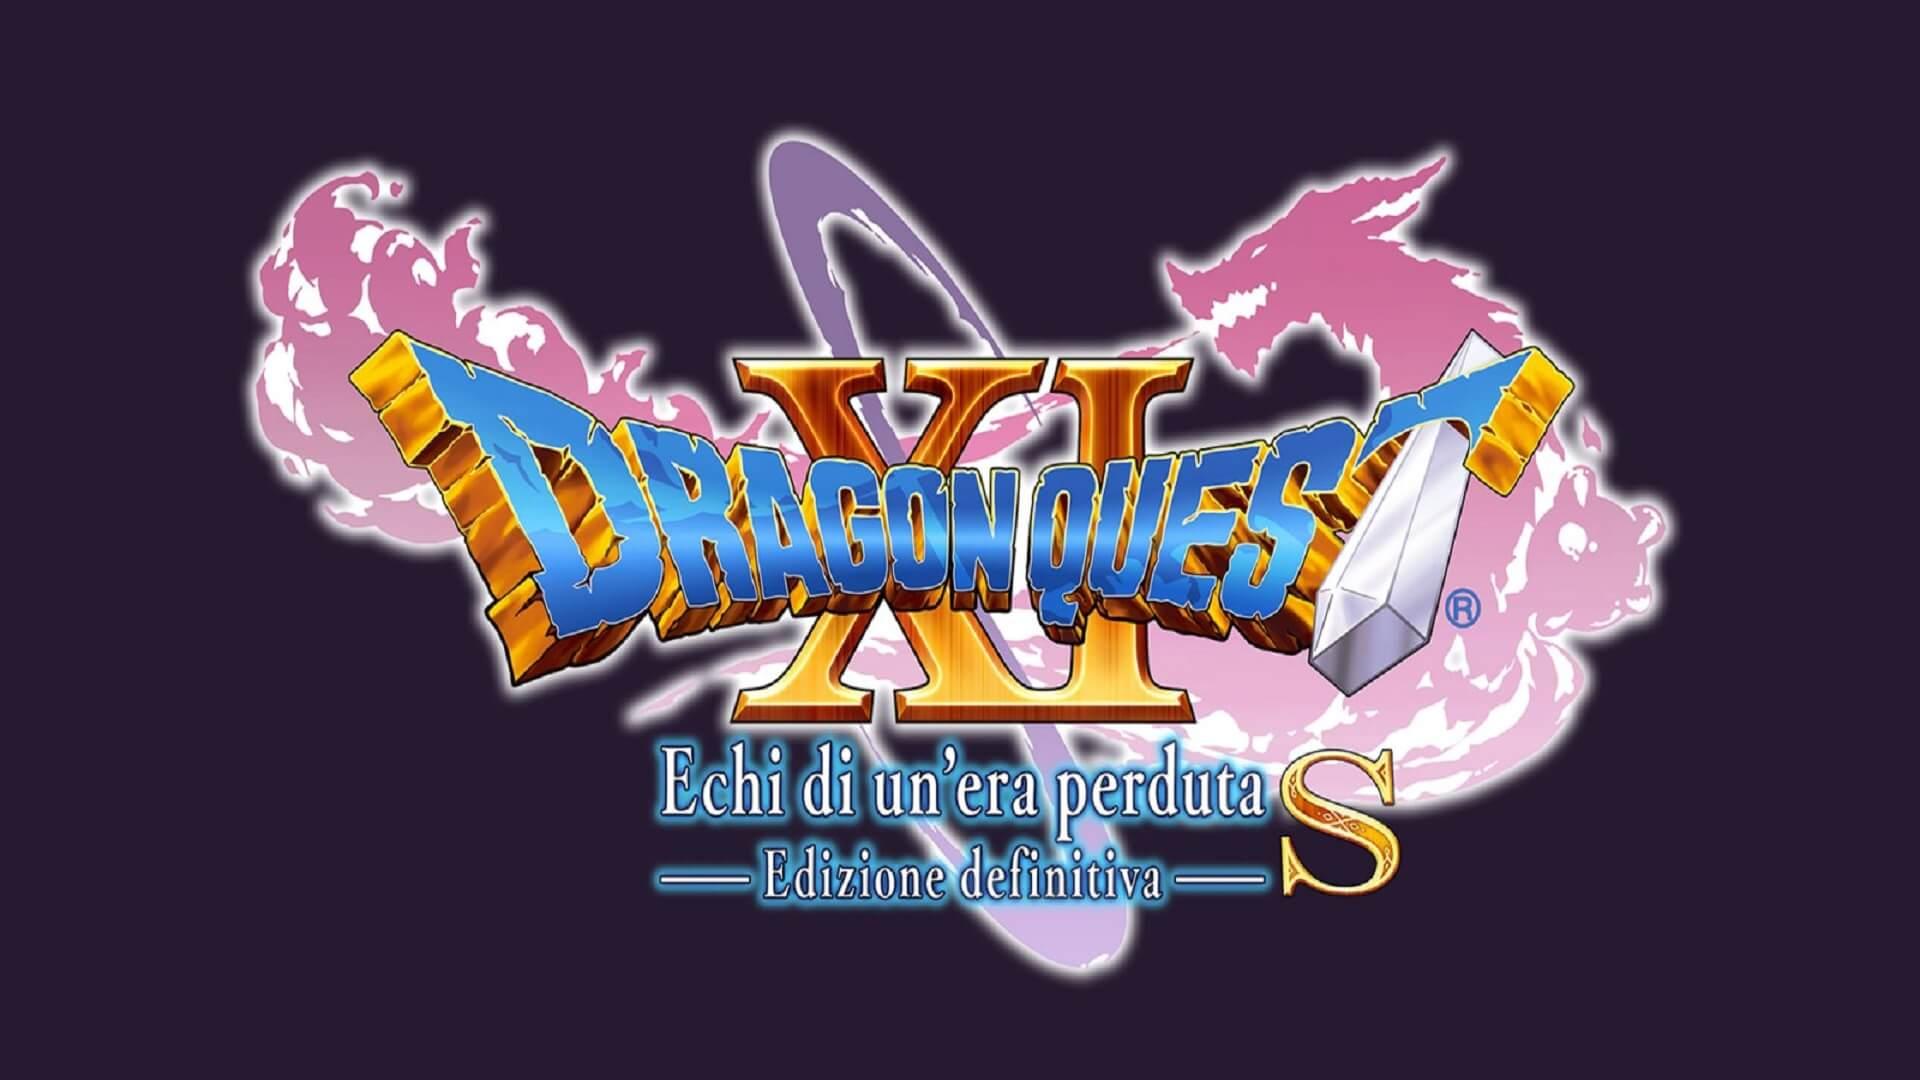 Dragon Quest XI S Echi di un'era perduta Definitive Edition